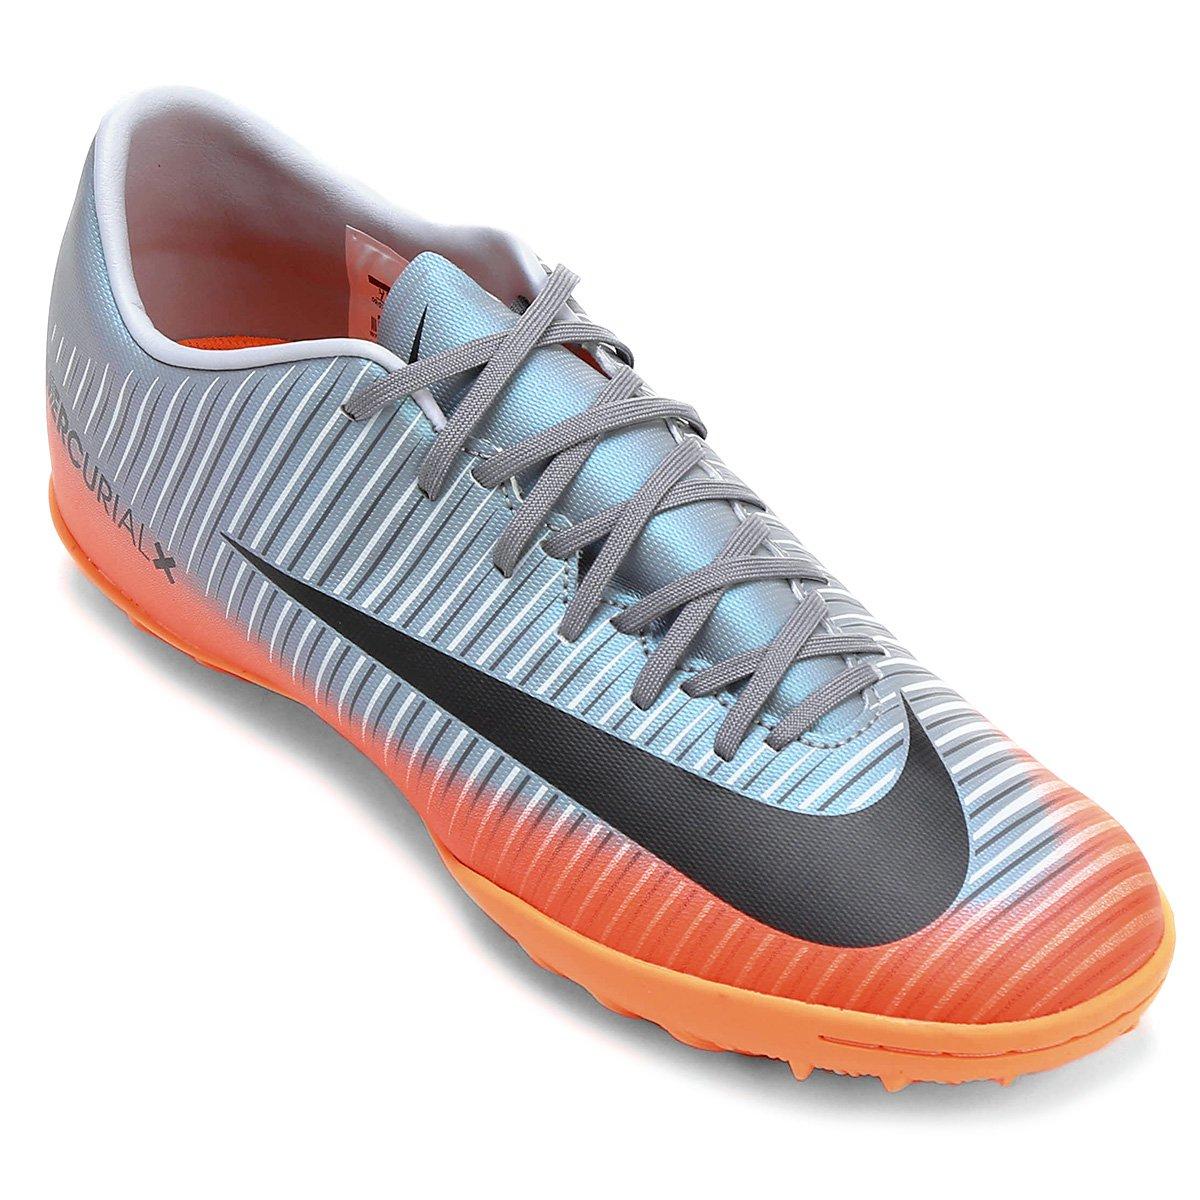 b12a2fa5ffd2a Chuteira Society Nike Mercurial X Victory 6 CR7 TF - Compre Agora ...